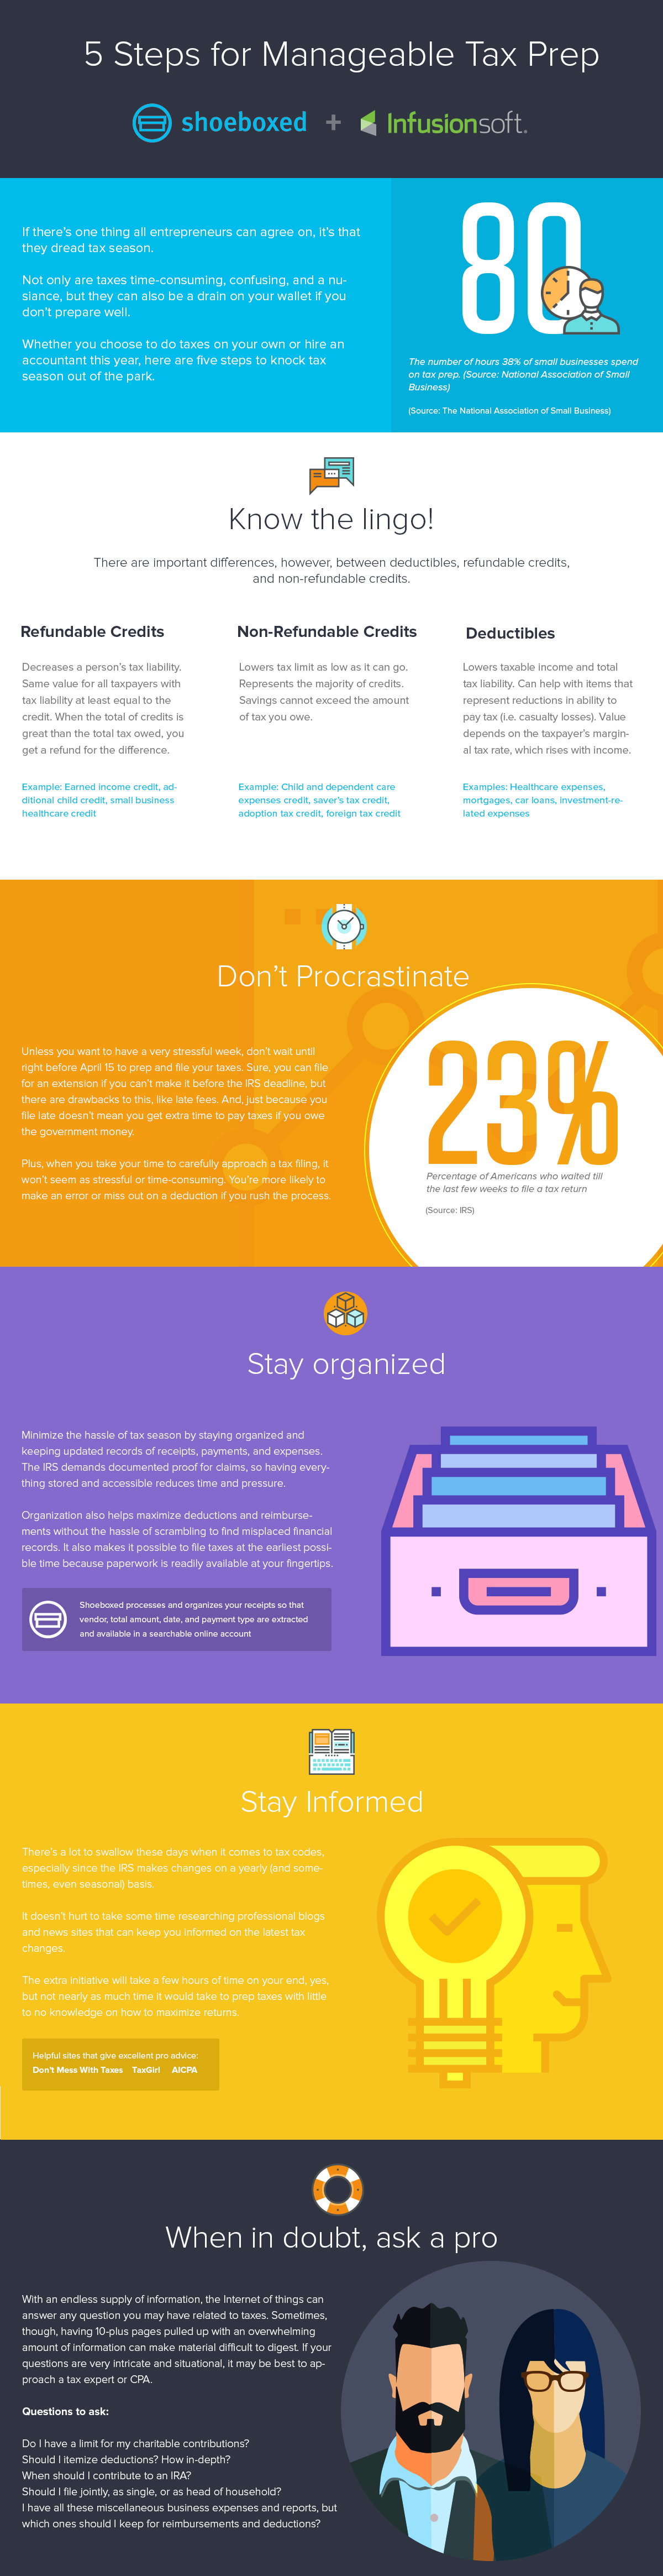 tax-prep-infusionsoft_infographic.jpeg